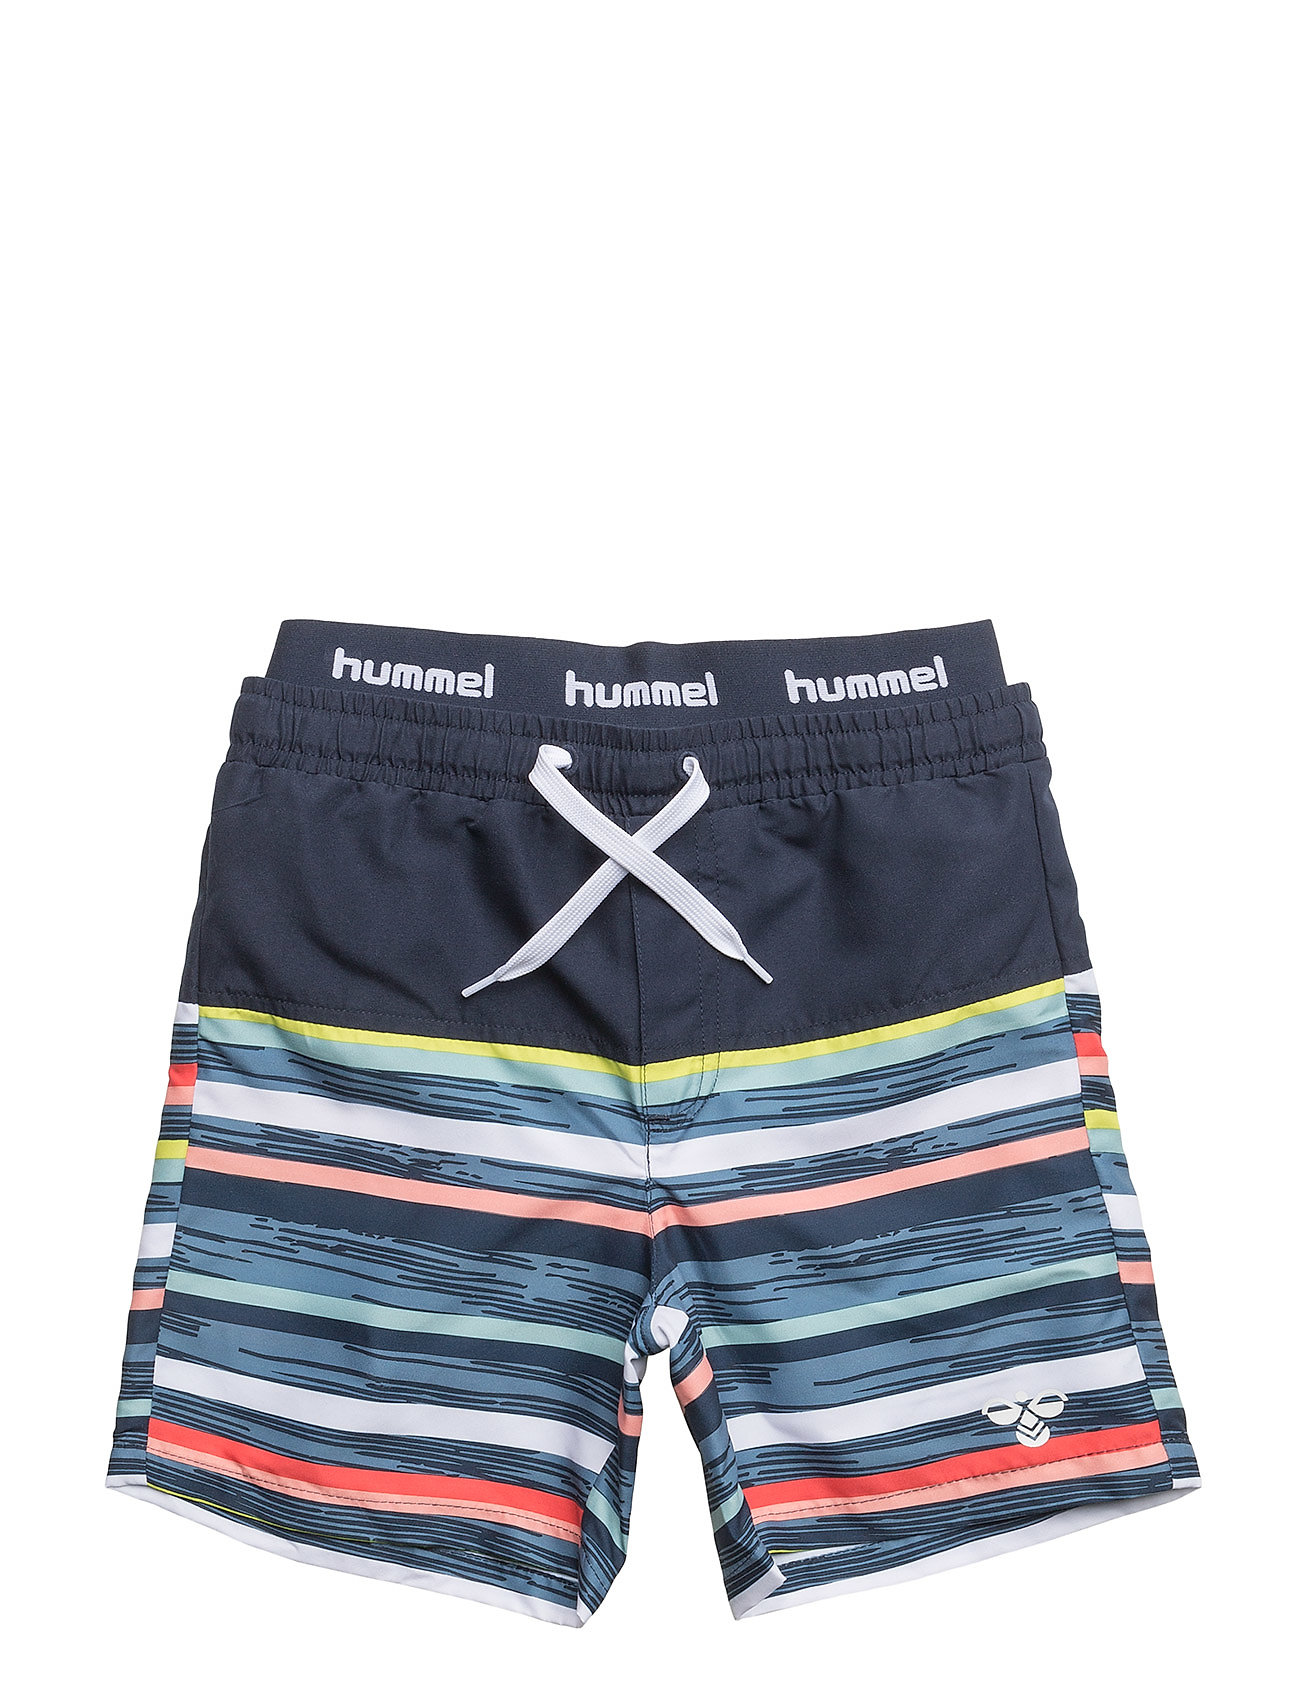 Spot Shorts - Hummel